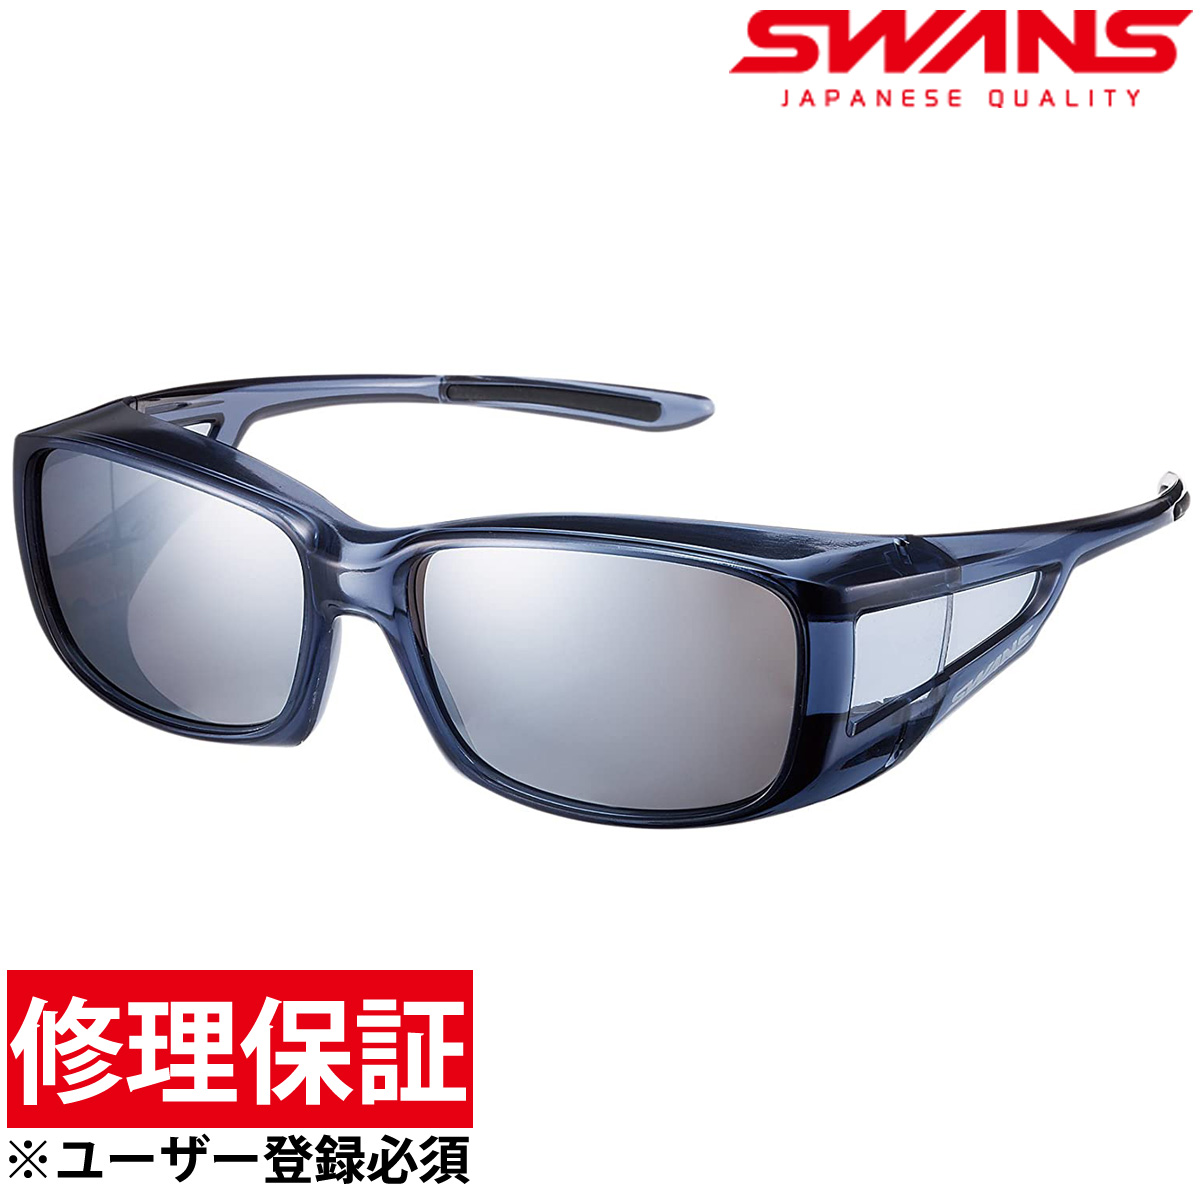 Over Glassesシリーズ スワンズ SWANS ブランド 紫外線カット 偏光サングラス オーバーグラス オーバーサングラス メガネの上から ランキングTOP10 偏光ミラーレンズモデル UVカット テニス スポーツ 運転 買取 OG4-0751-SCLA 釣り メンズ ゴルフ 野球 ドライブ